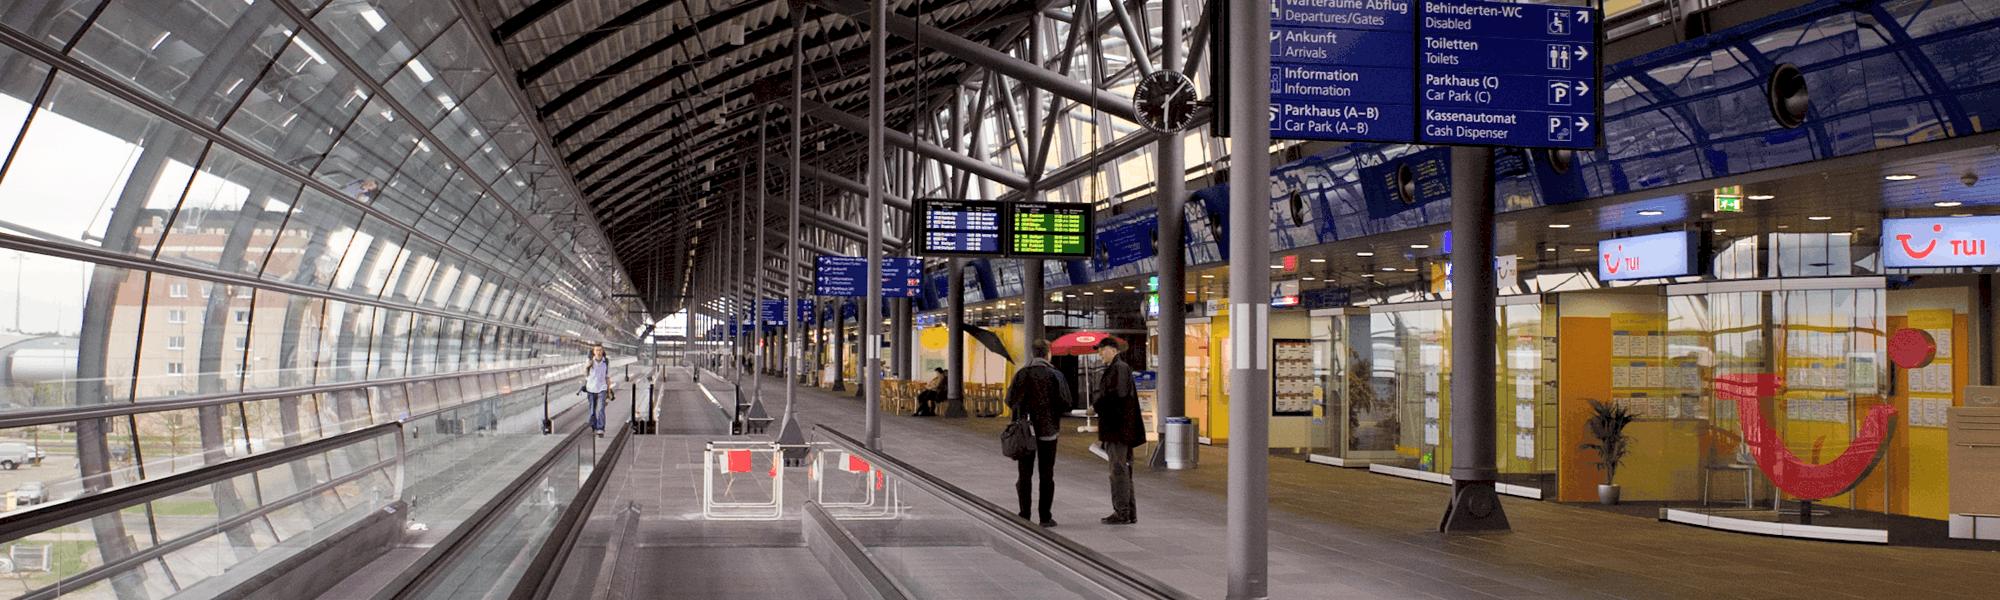 TUI und TUI fly jetzt mit komplettem Winterflugplan ab Leipzig/Halle